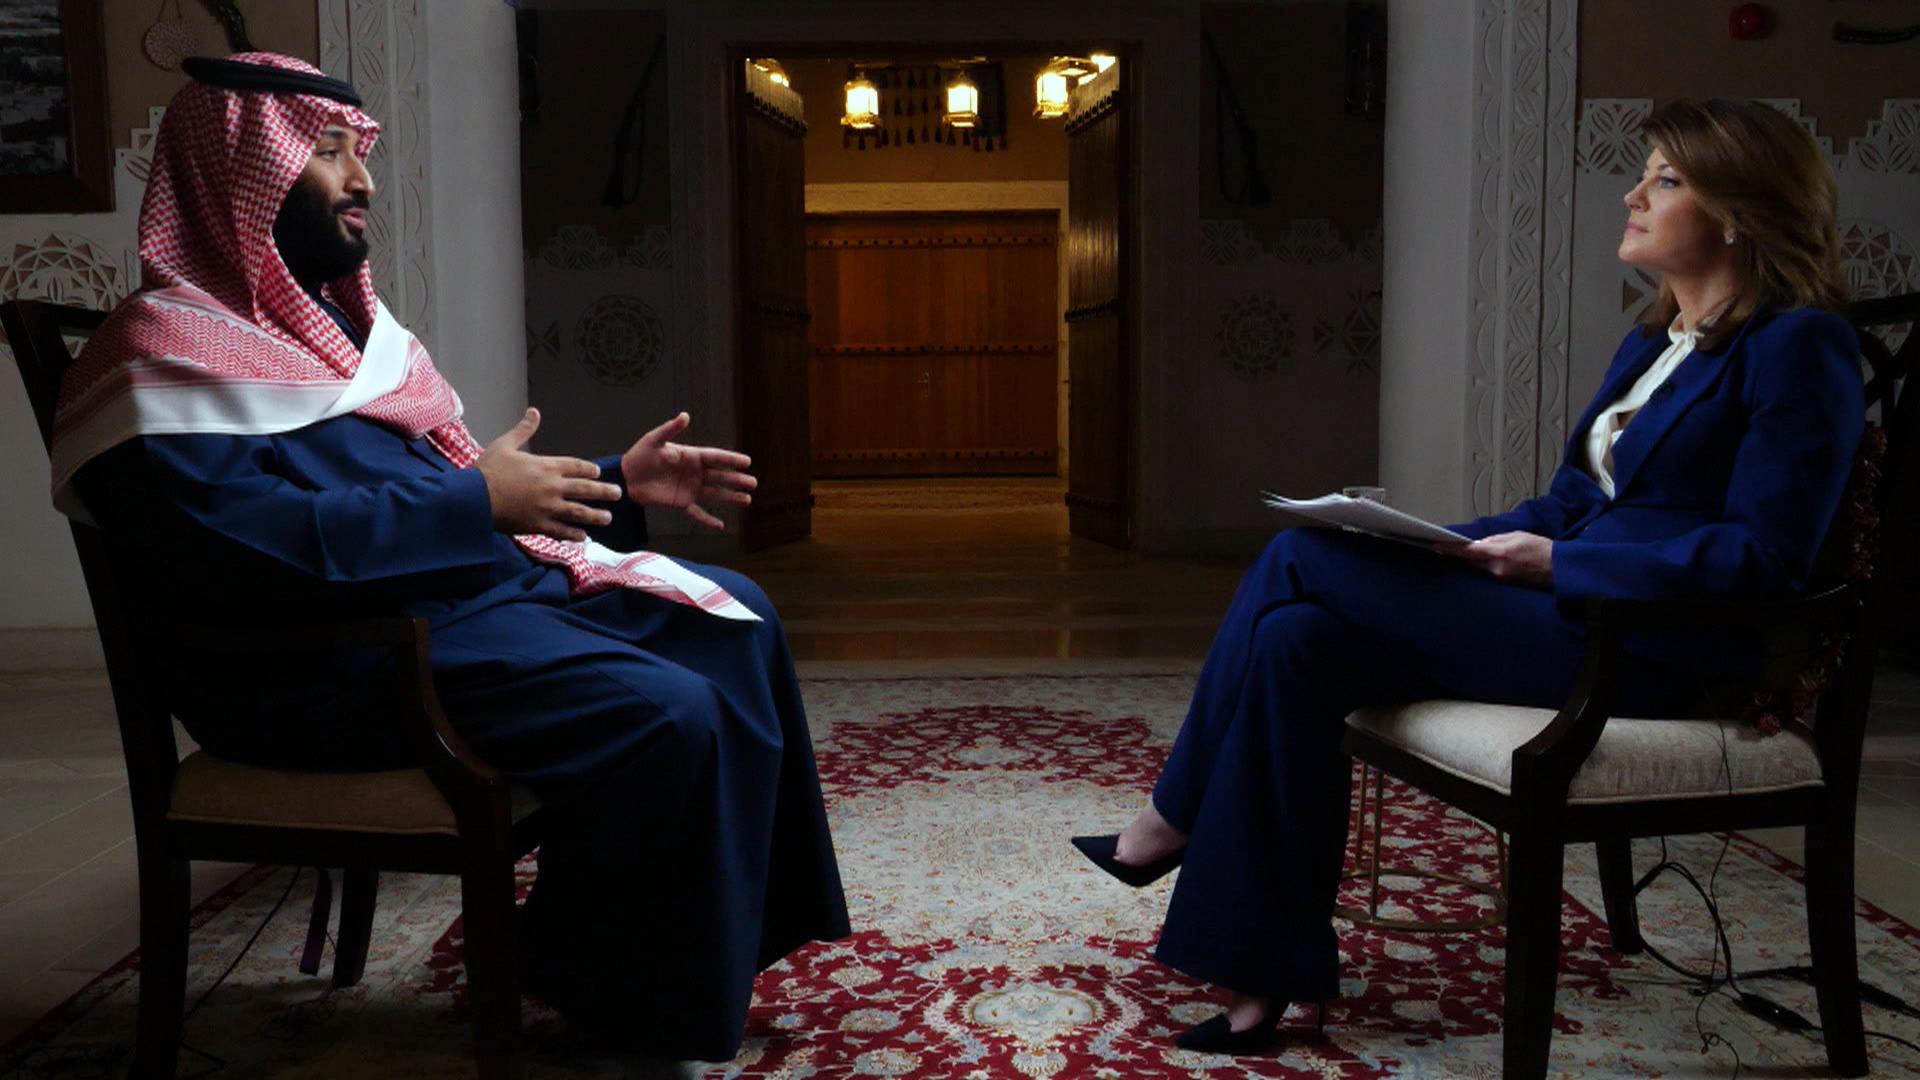 Mohammed bin Salman, Saudi crown prince 60 Minutes Interview